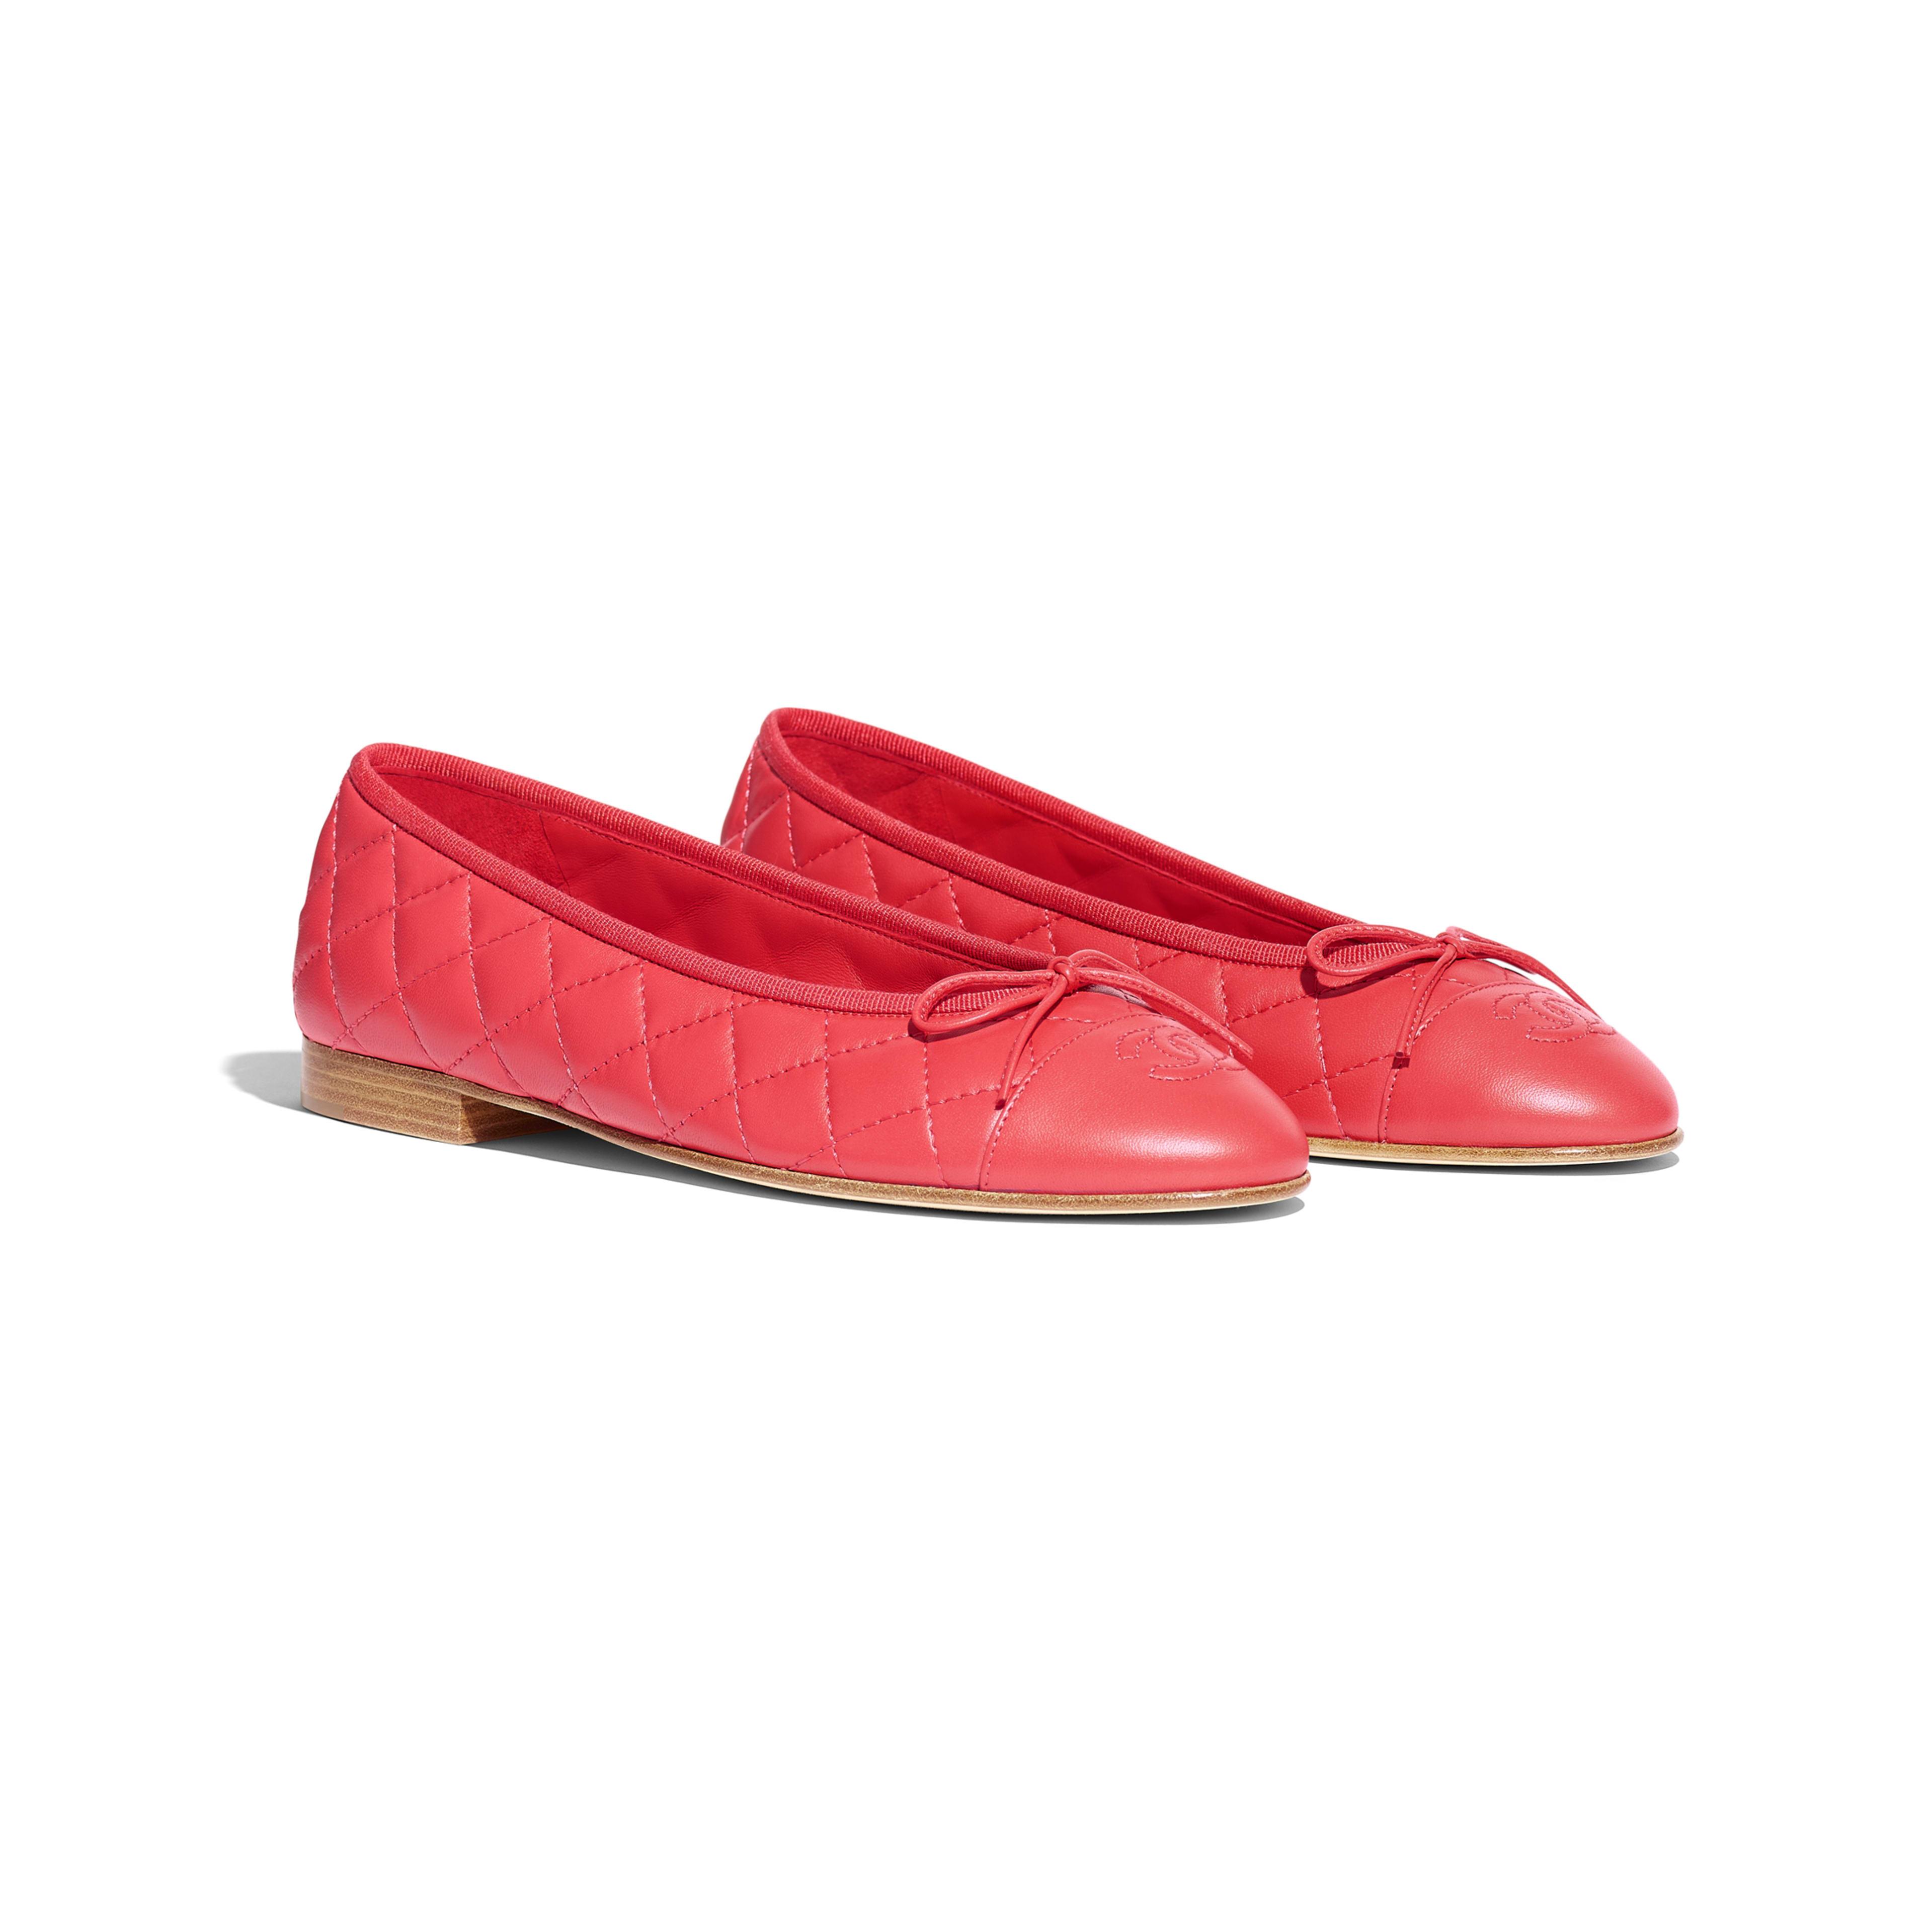 Ballerinas - Red - Lambskin - Alternative view - see full sized version